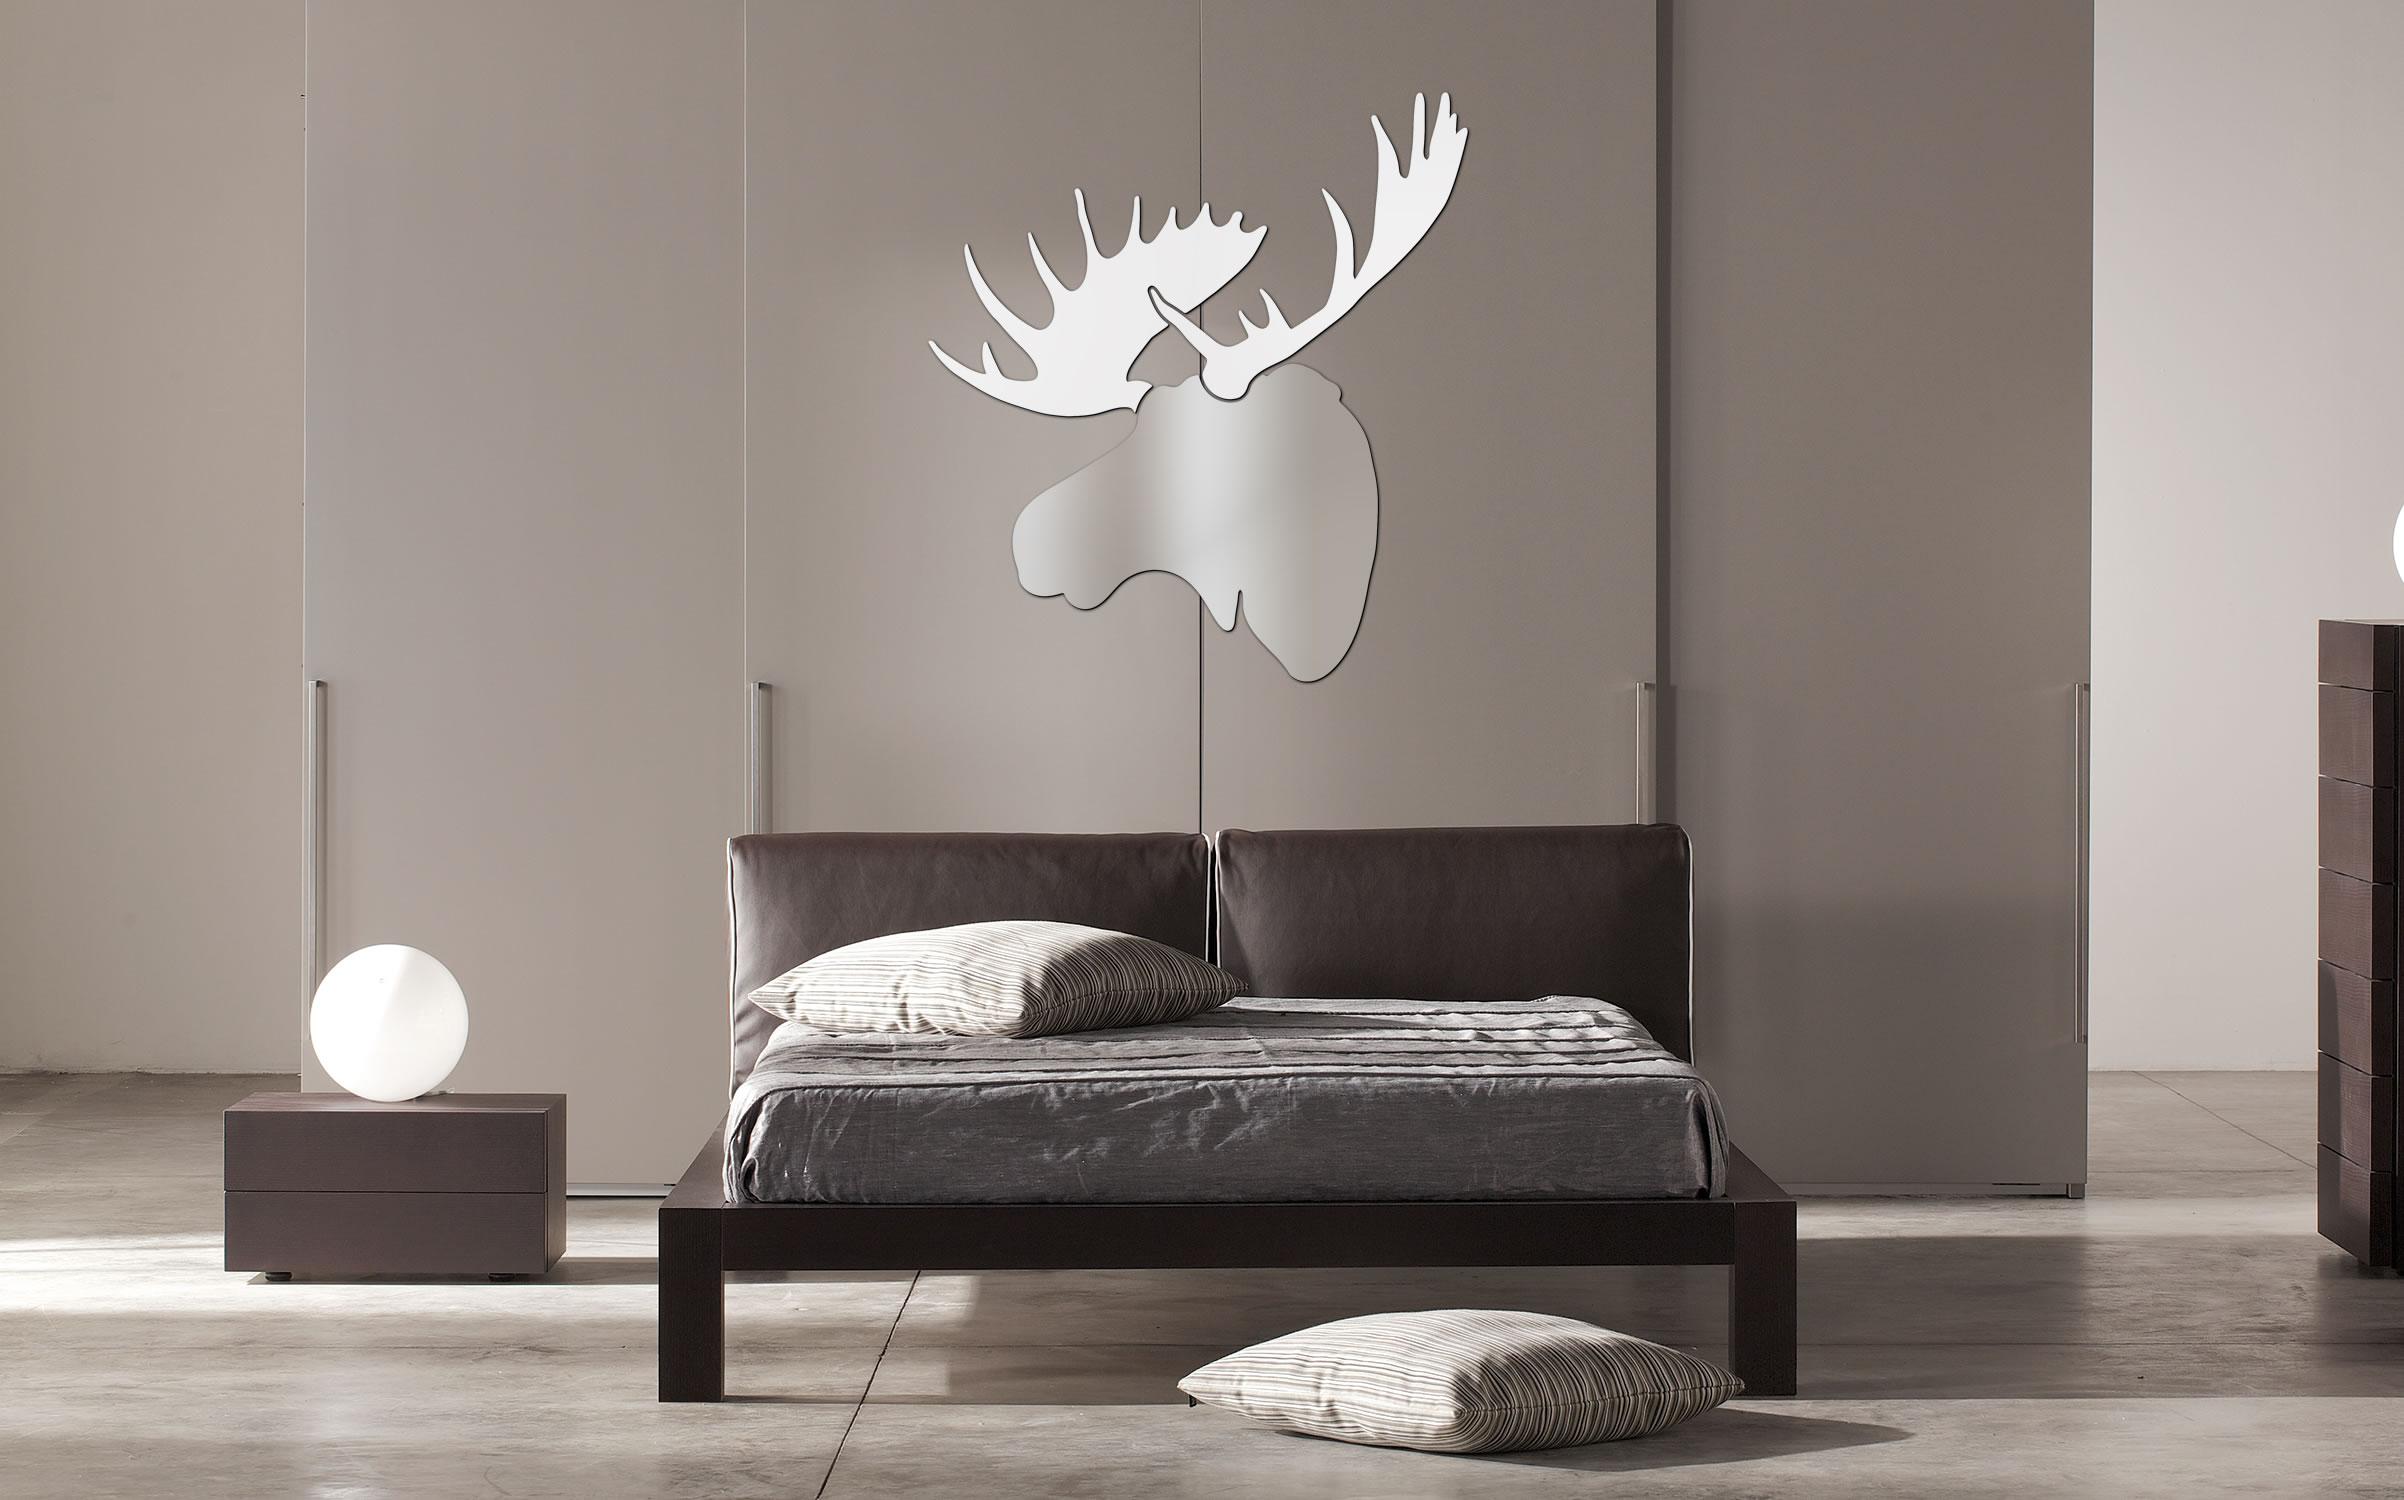 WINTER MOOSE - 36x36 in. Silver & White Decor - Lifestyle Image